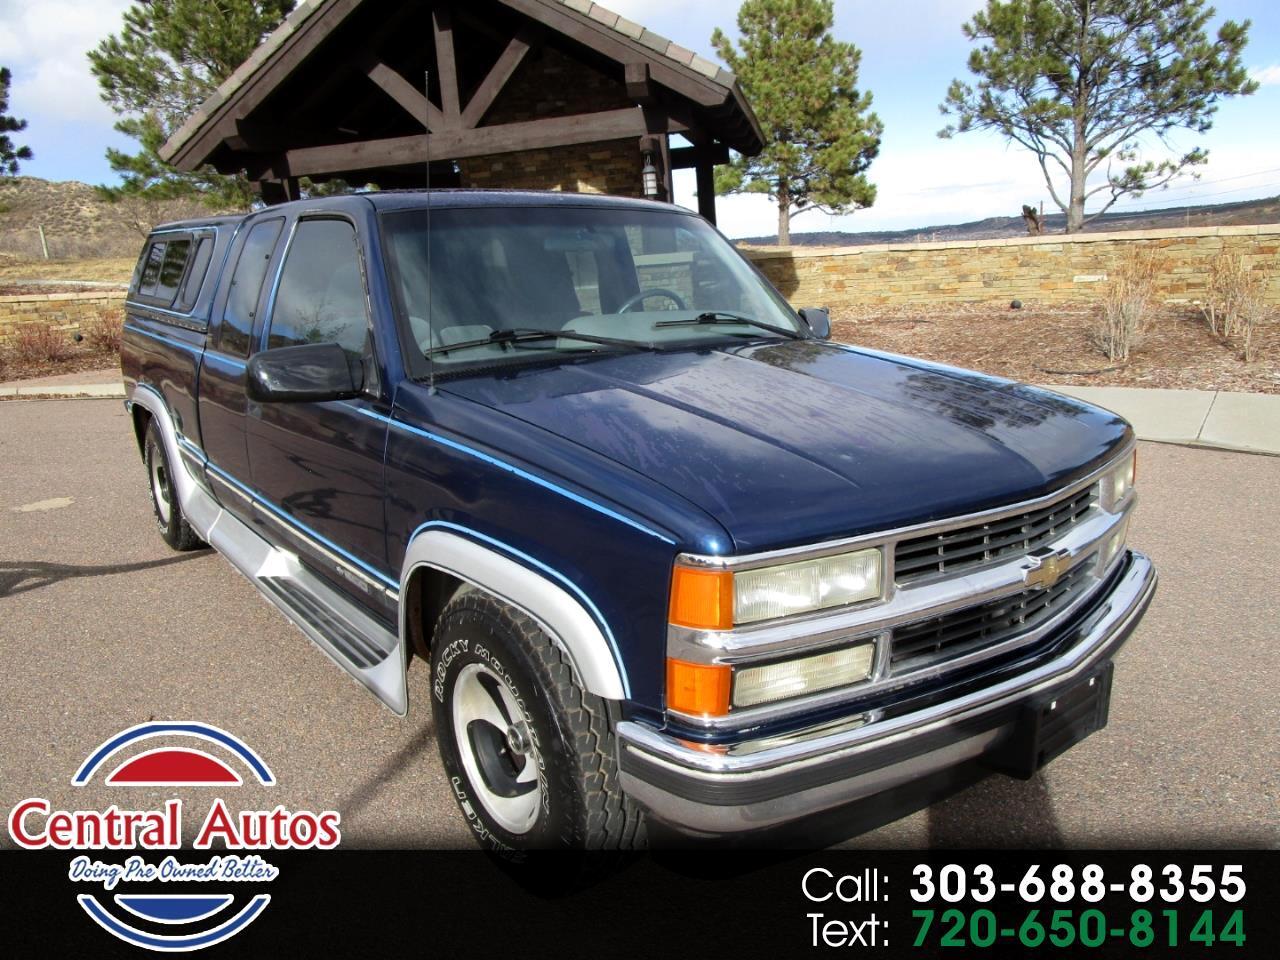 1995 Chevrolet C/K 1500 Ext Cab 141.5